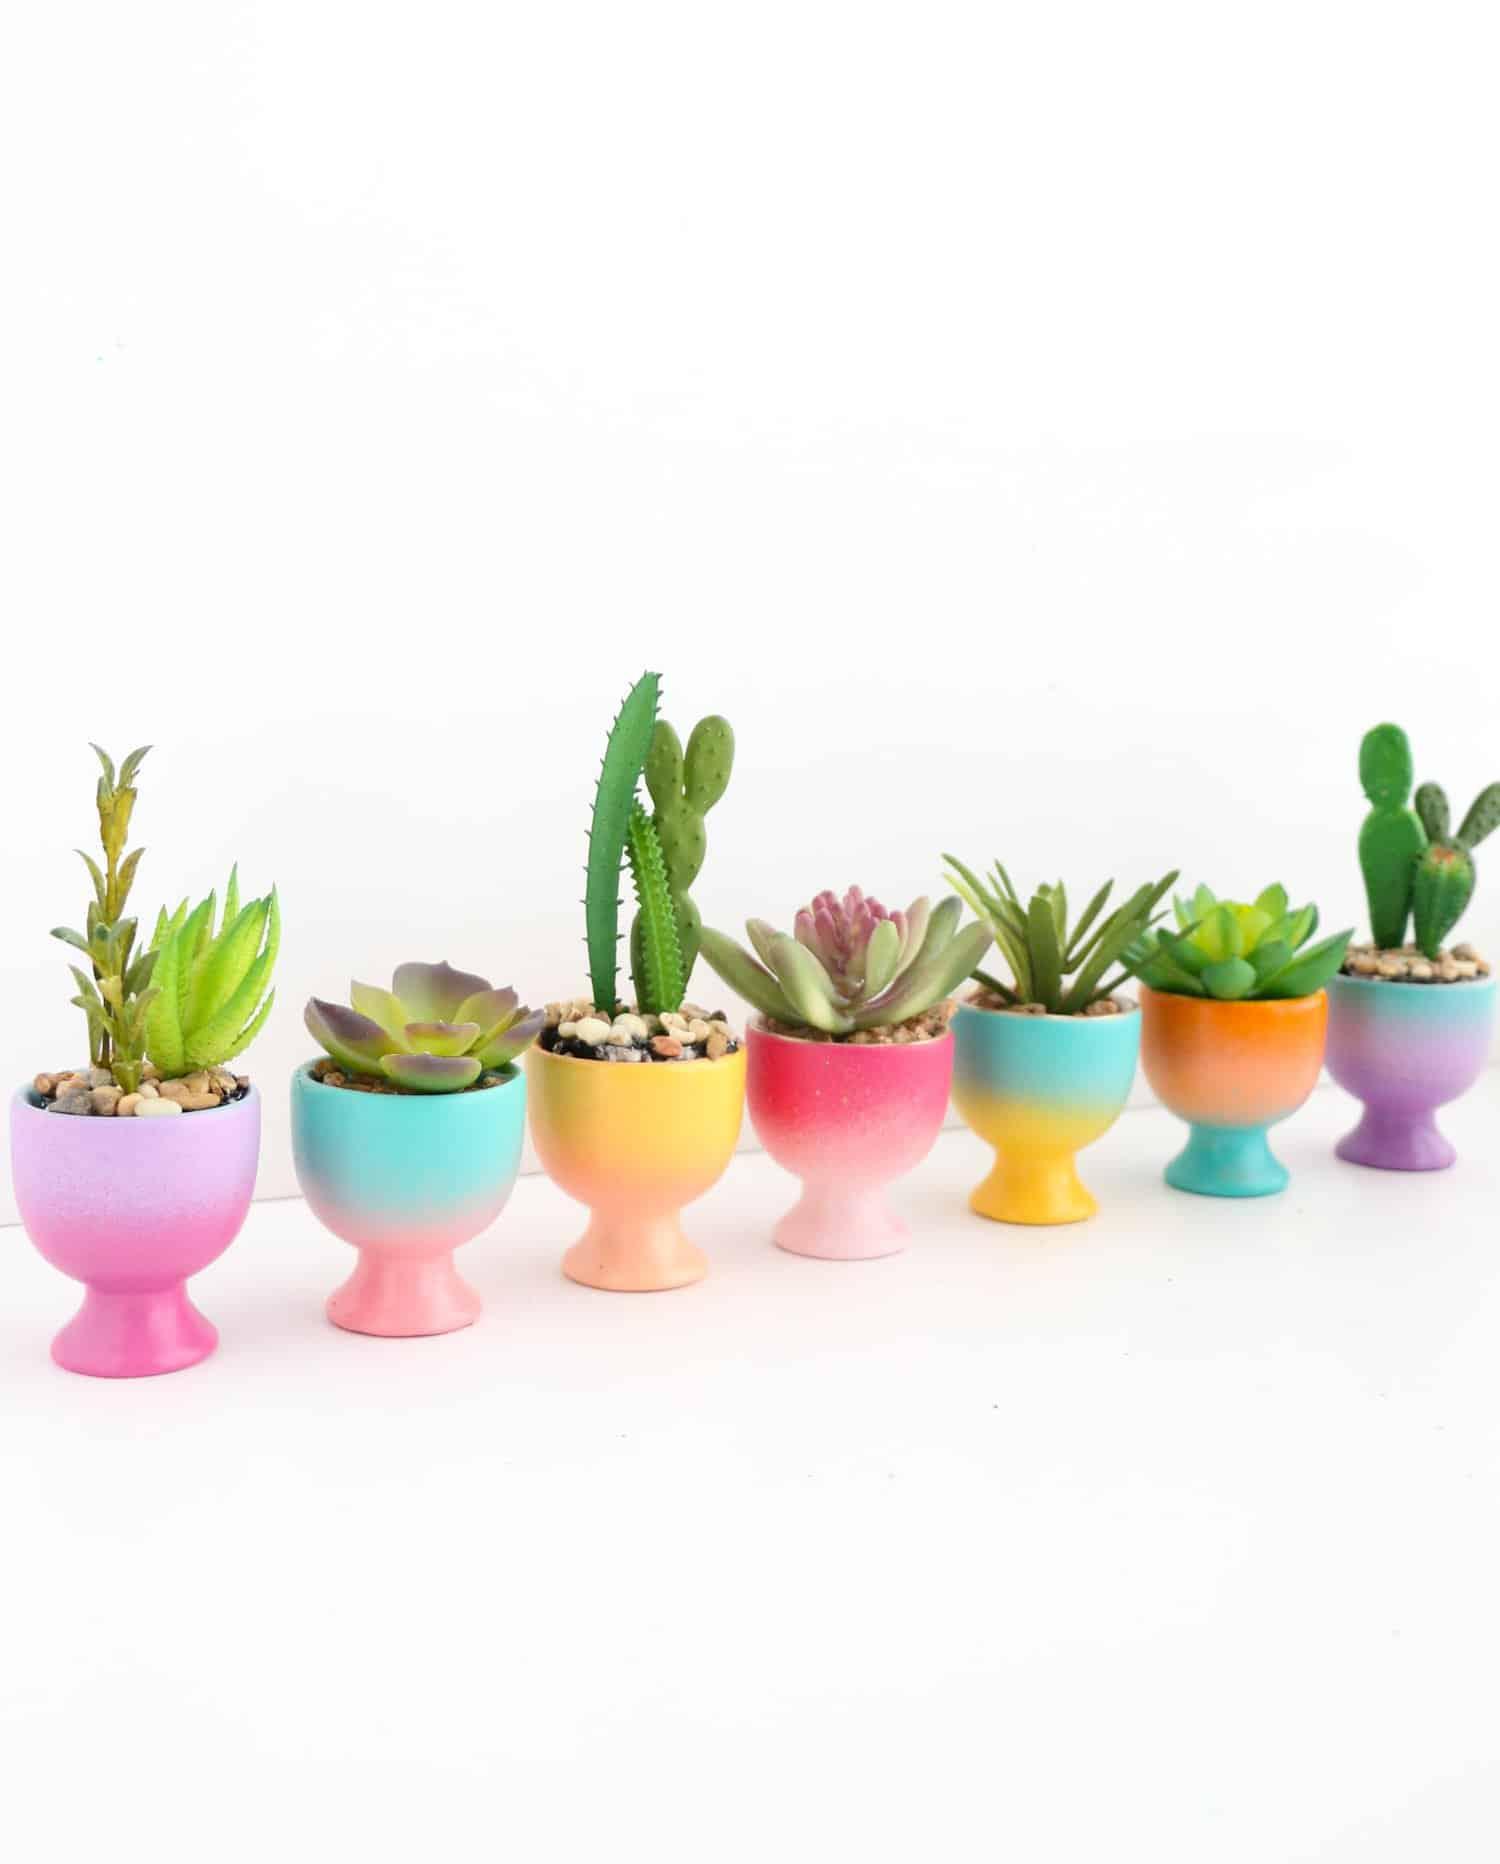 DIY Mini Gradient Egg Cup Planters